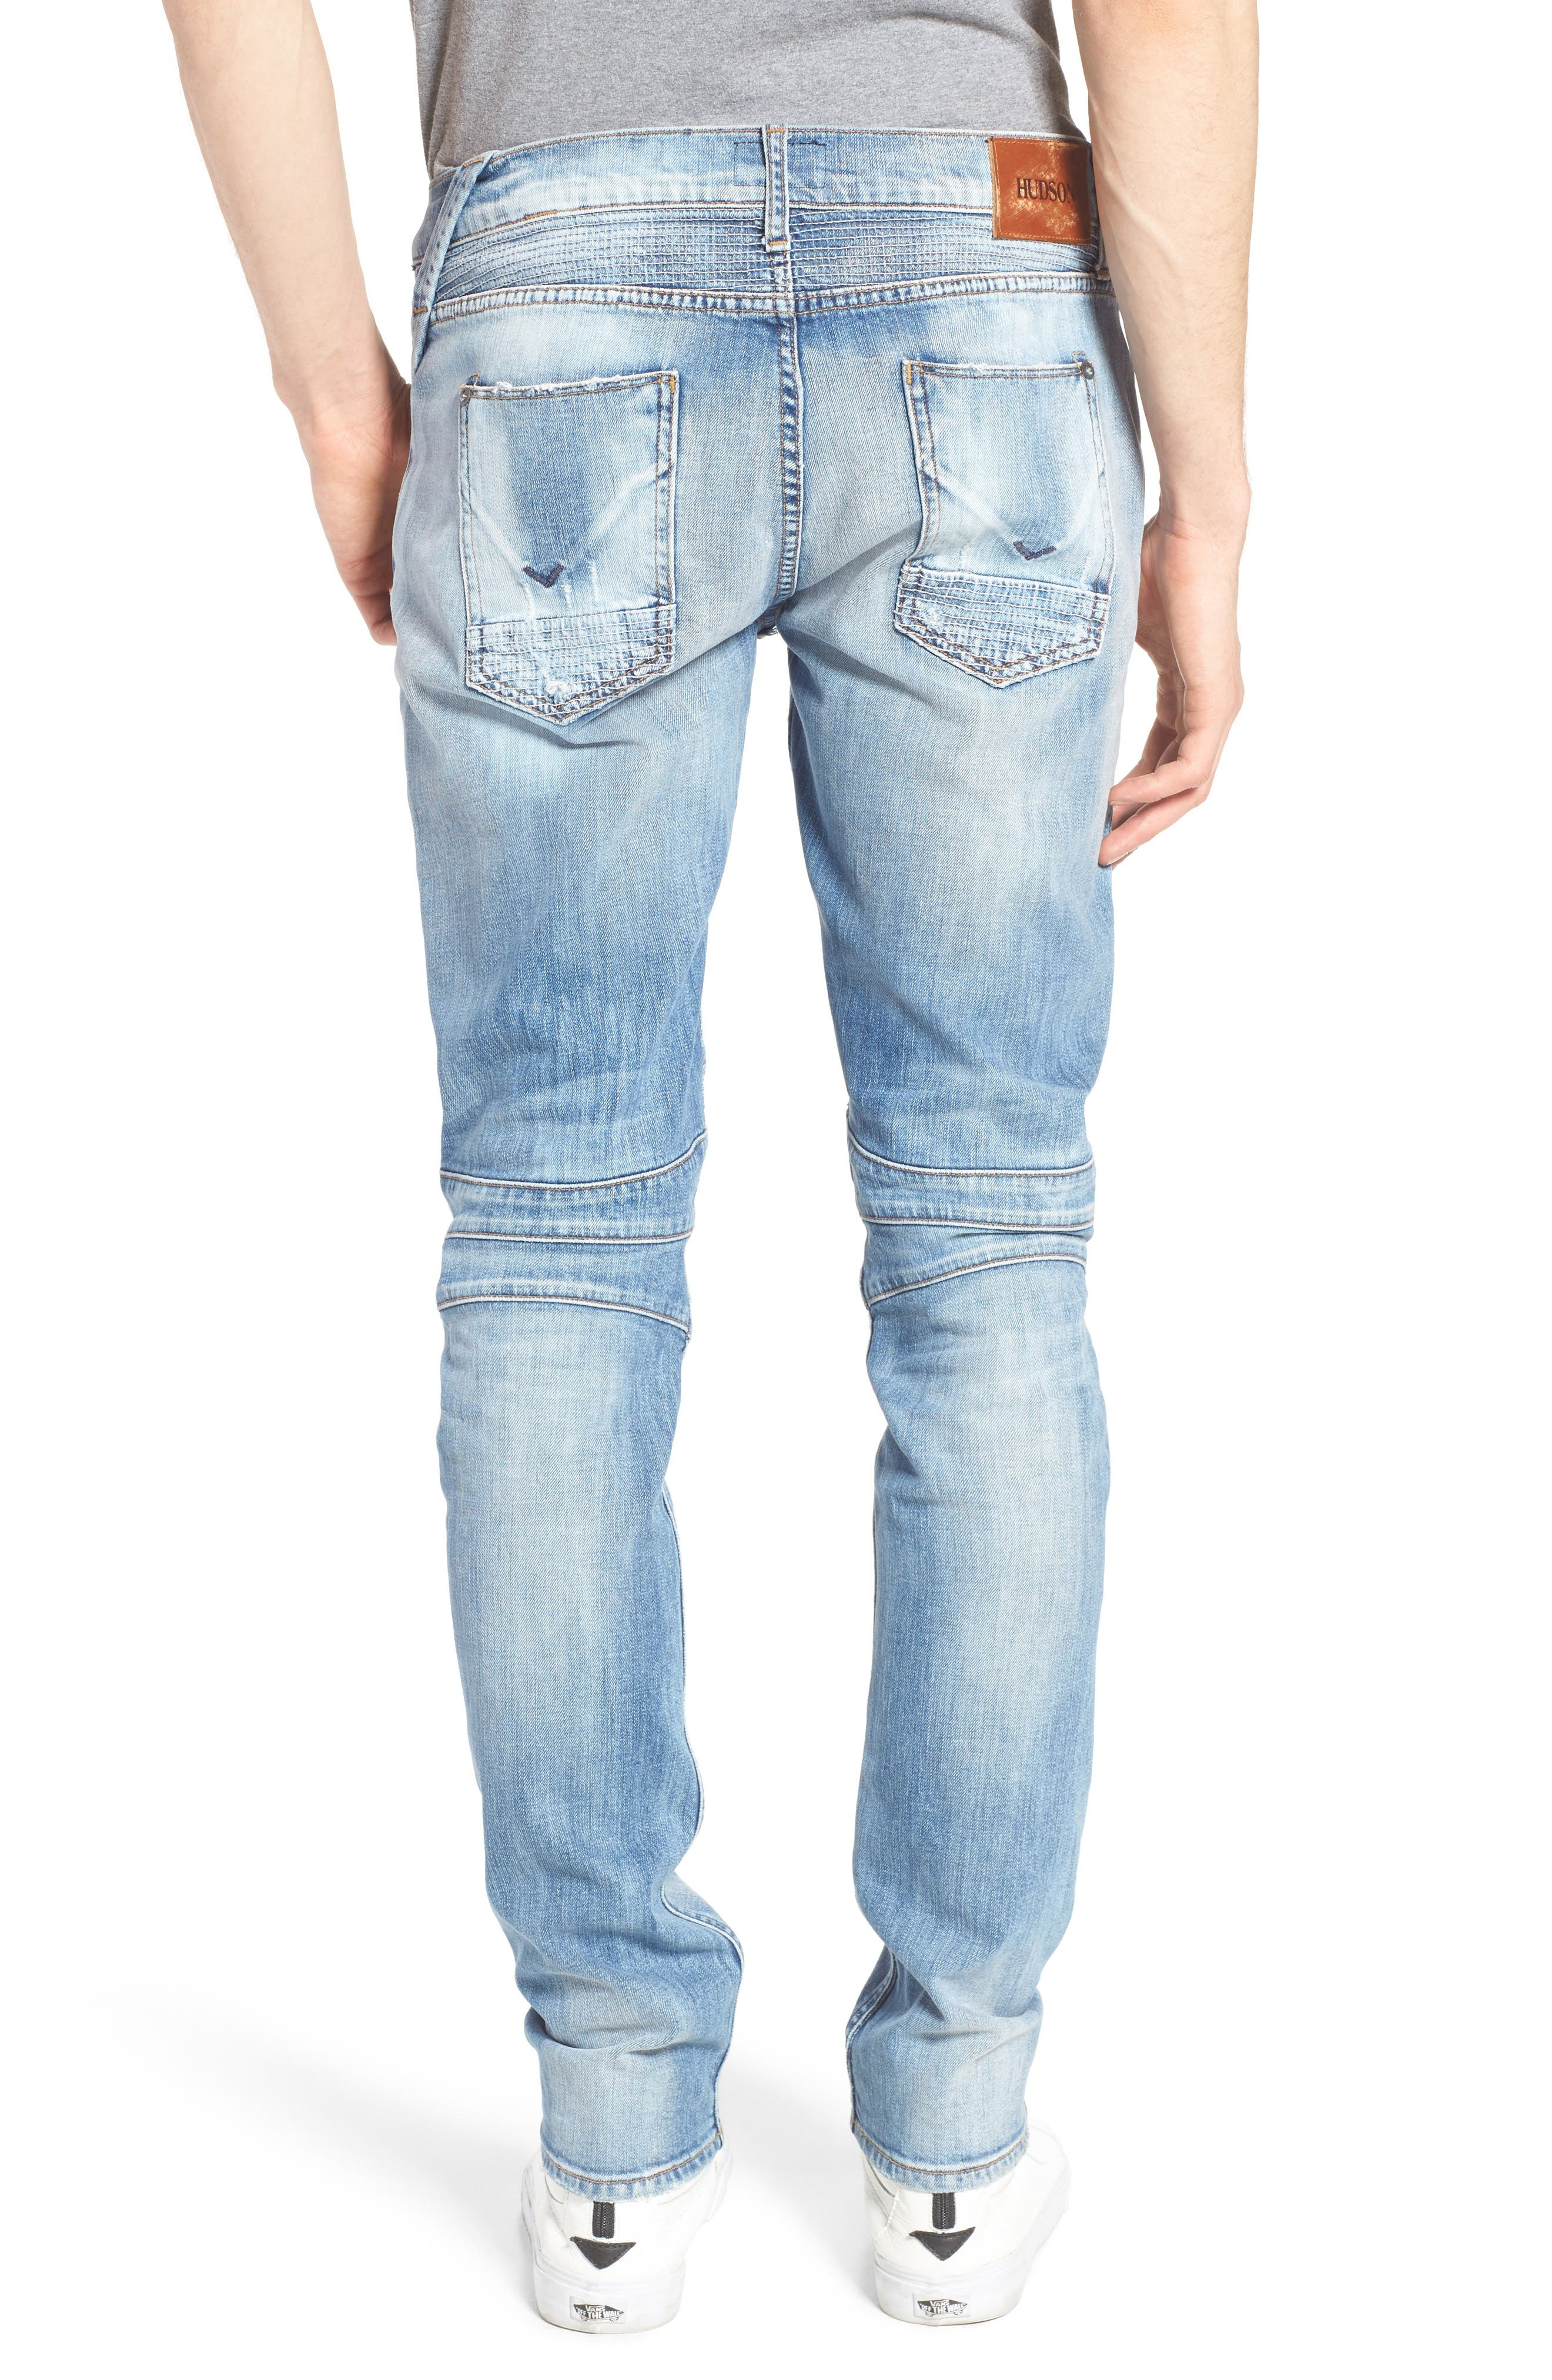 Blinder Skinny Fit Moto Jeans,                             Alternate thumbnail 2, color,                             THRASH